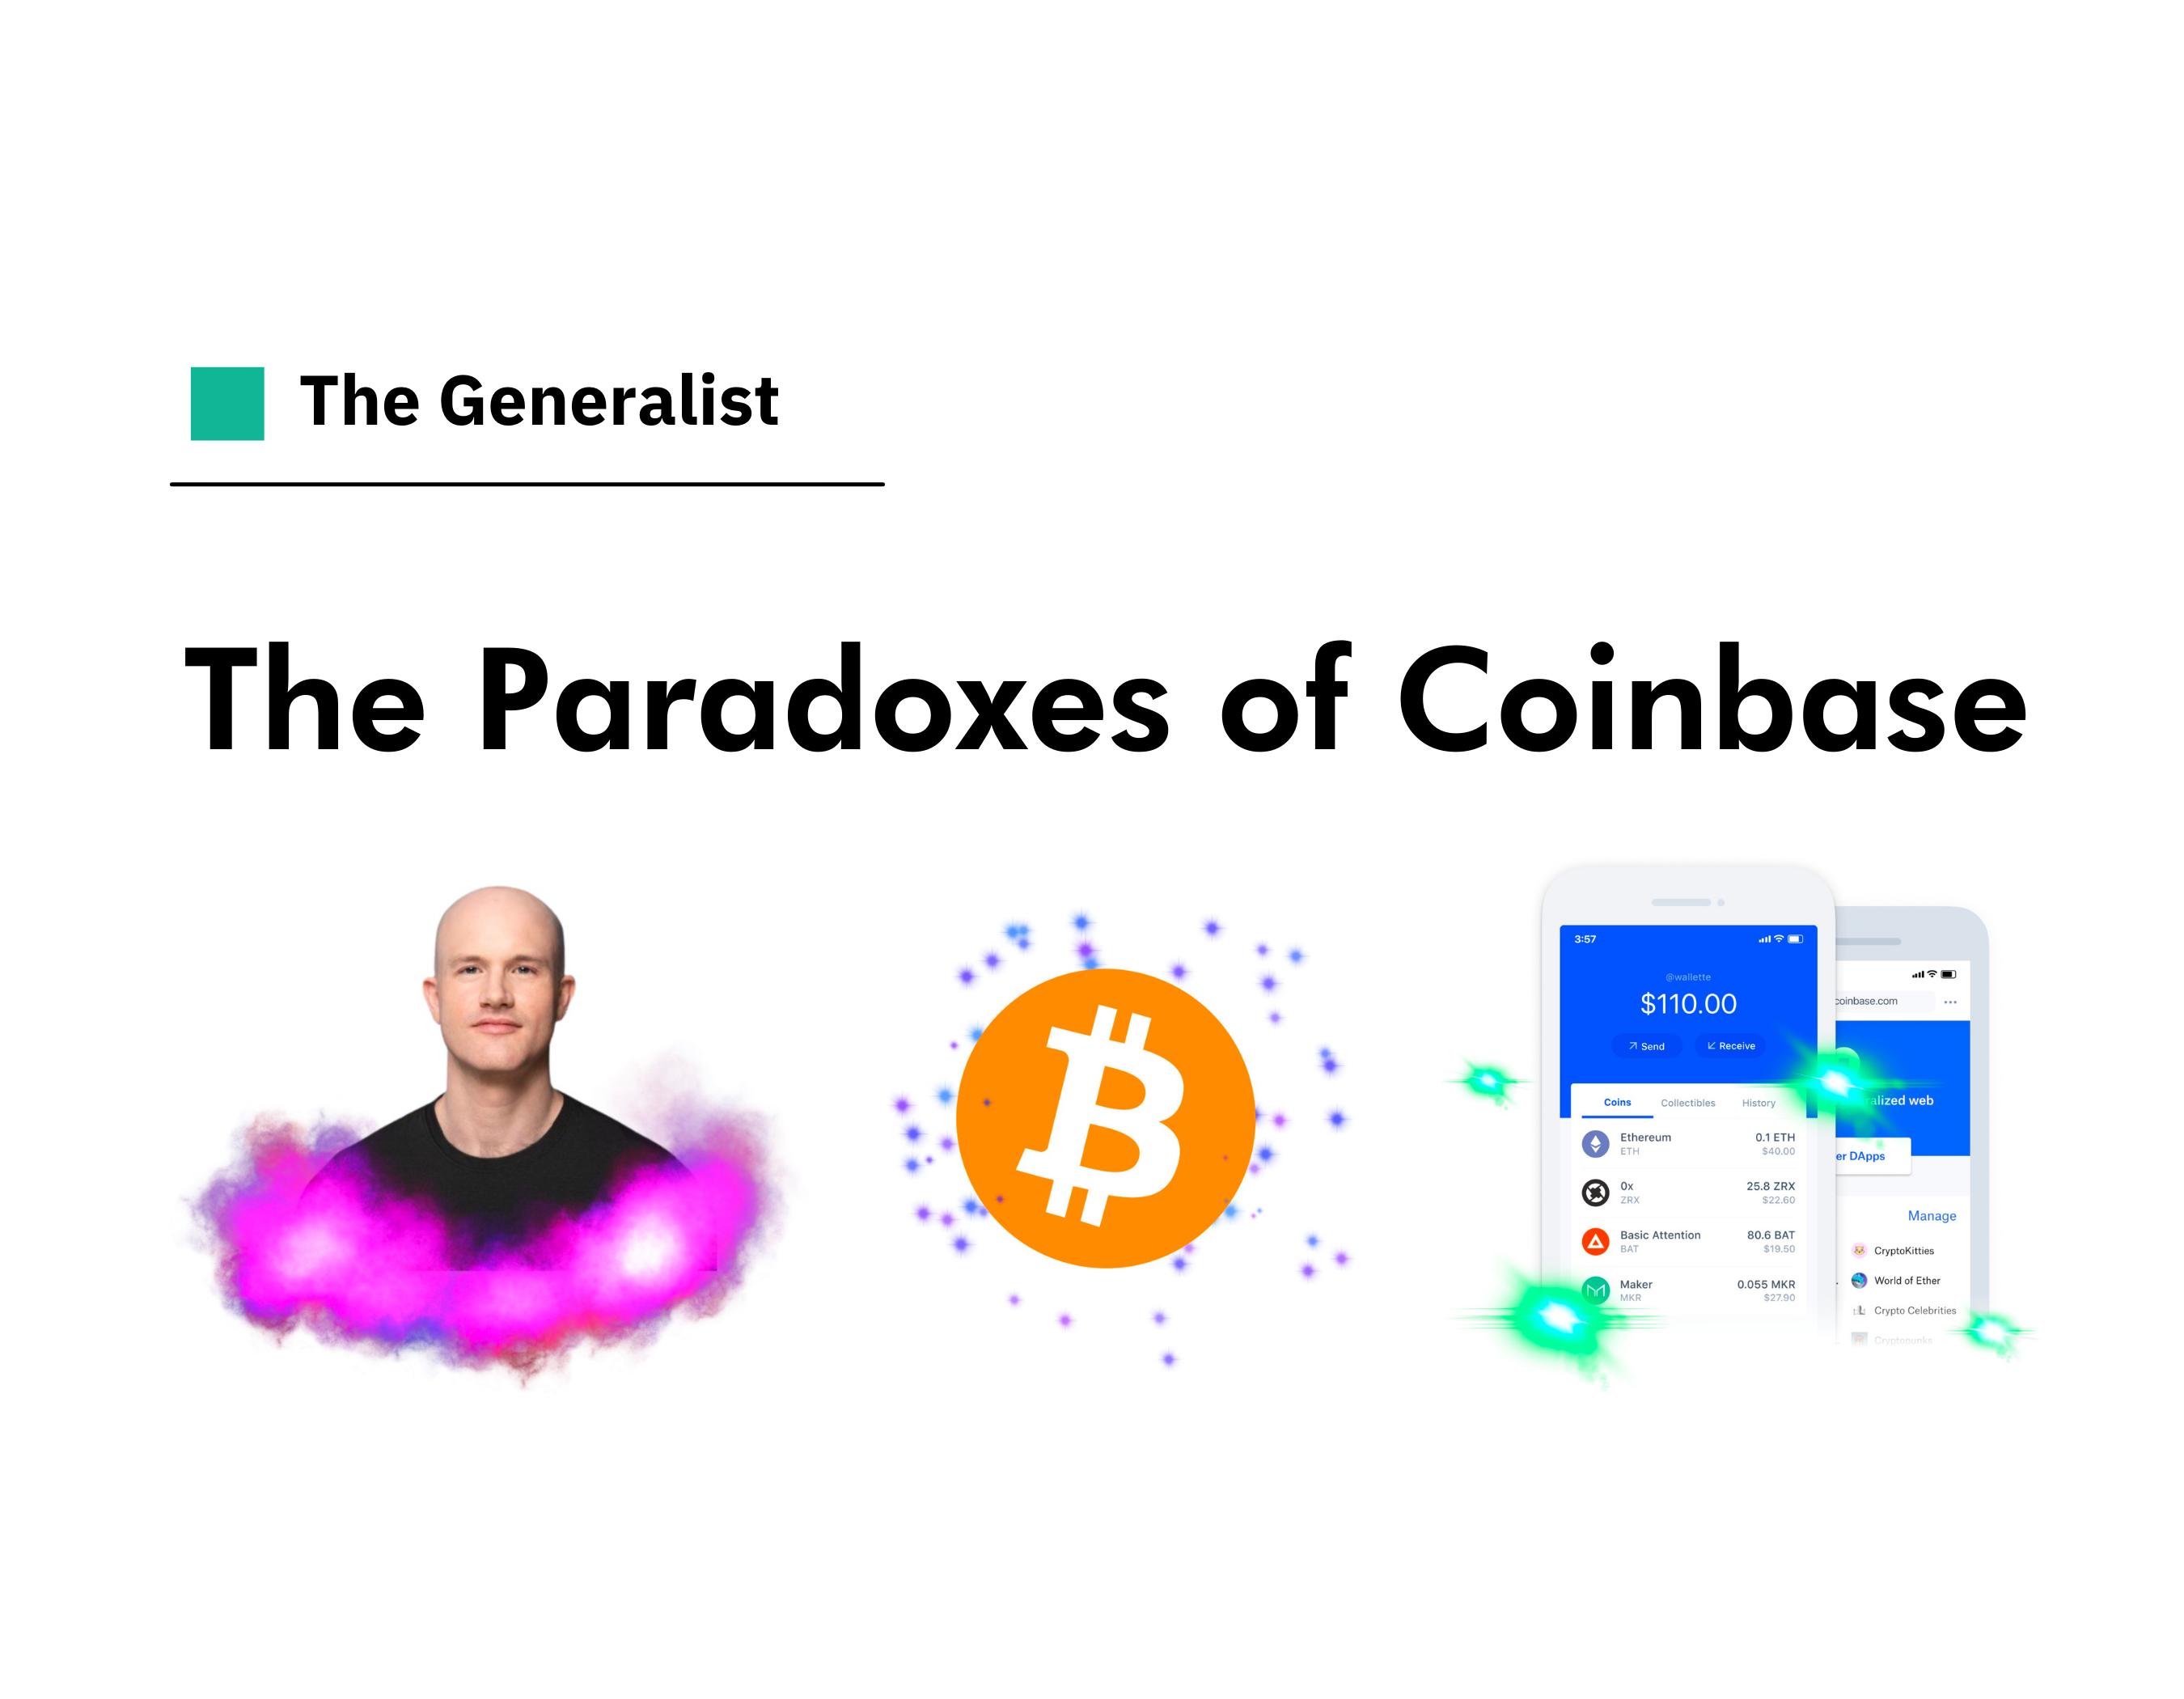 The Paradoxes of Coinbase